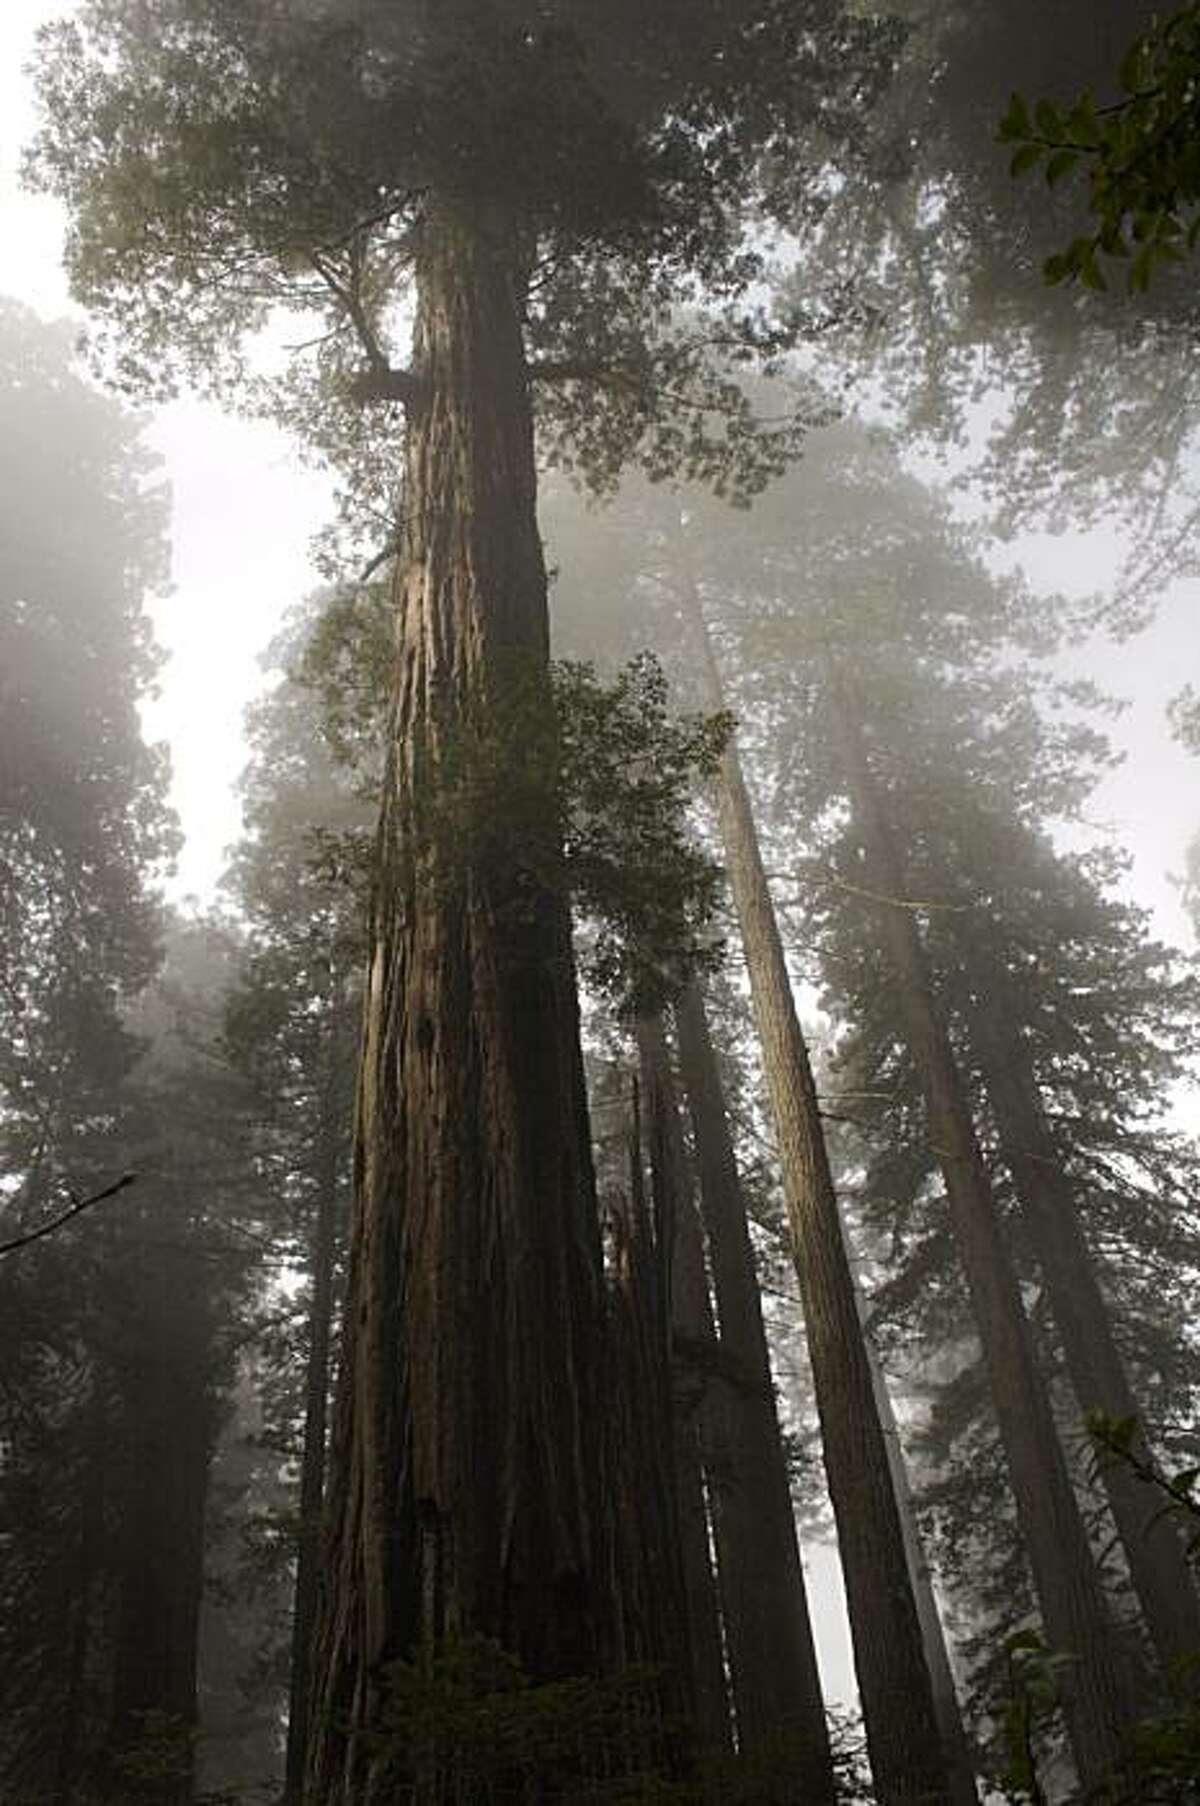 Coastal redwoods scrape the foggy sky in Prairie Creek Redwood State Park in northern Humboldt County.